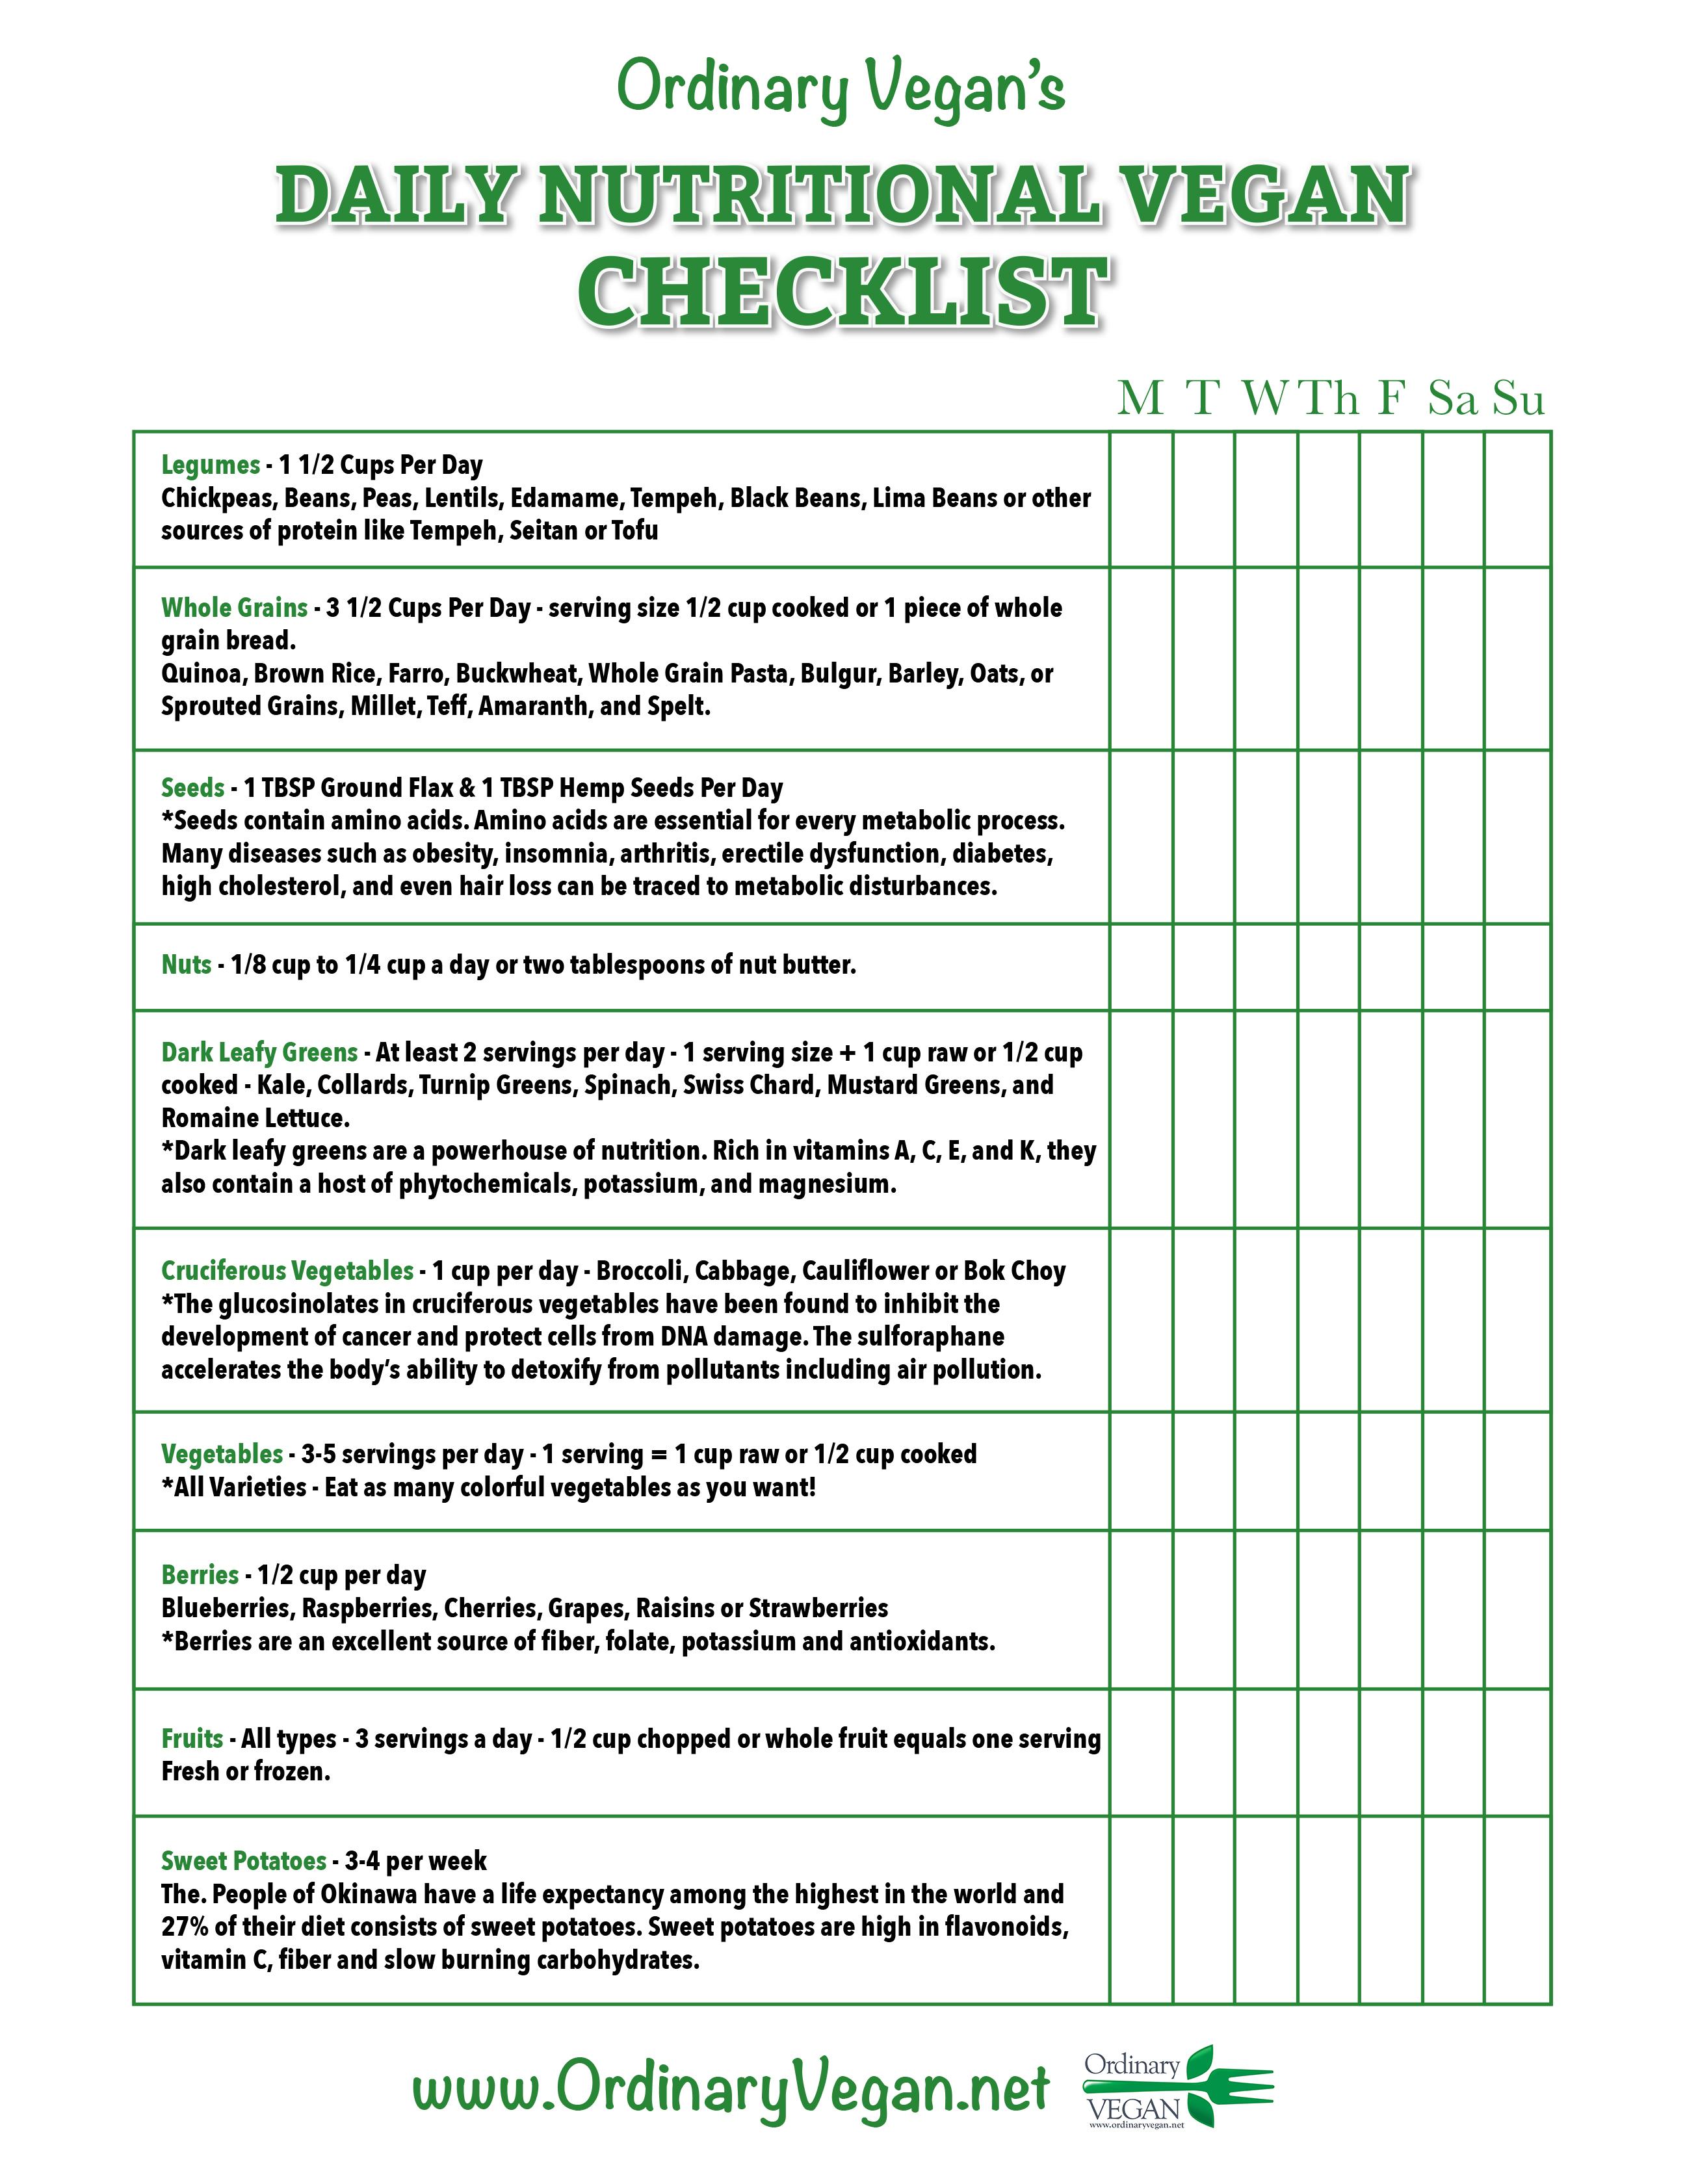 Vegan Nutrition Checklist For A Healthy Vegan Diet